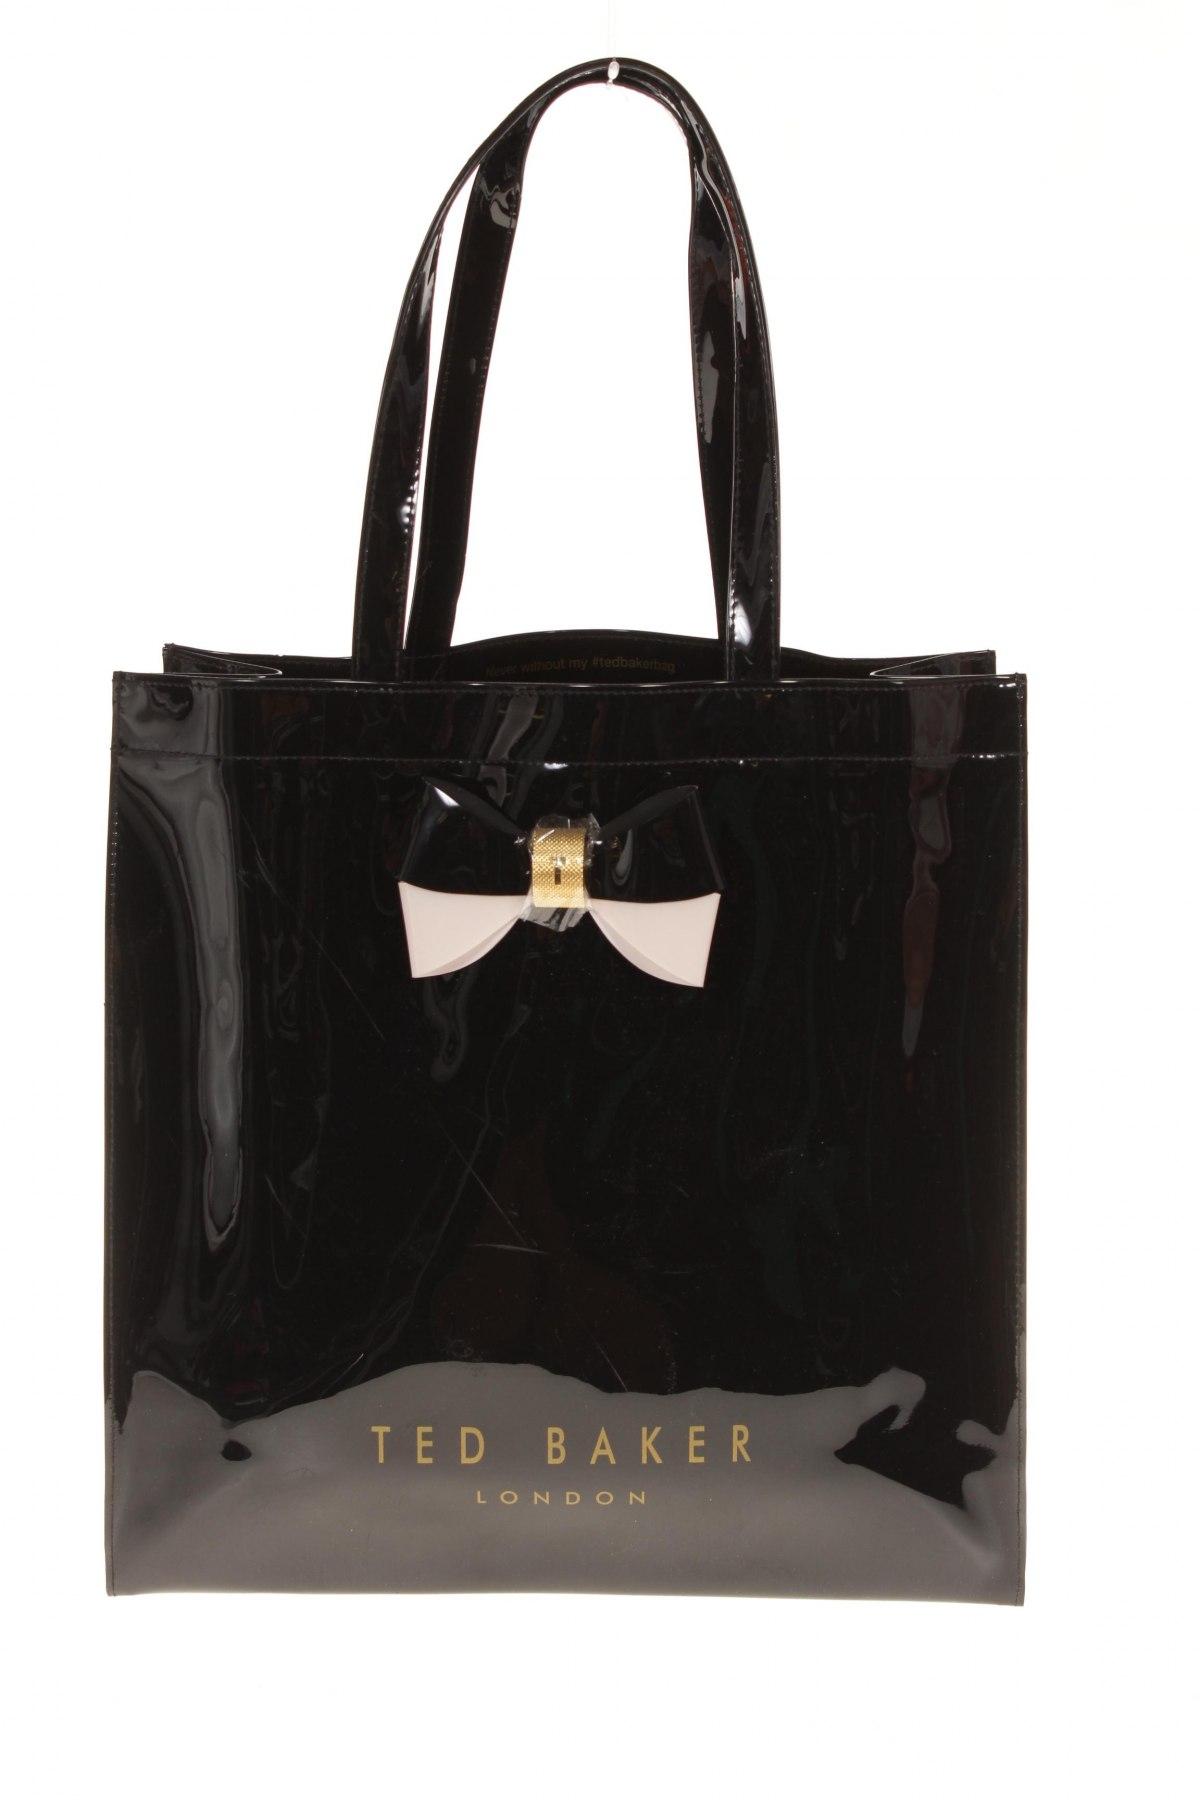 435e3c0b0b Γυναικεία τσάντα Ted Baker - σε συμφέρουσα τιμή στο Remix -  6972890